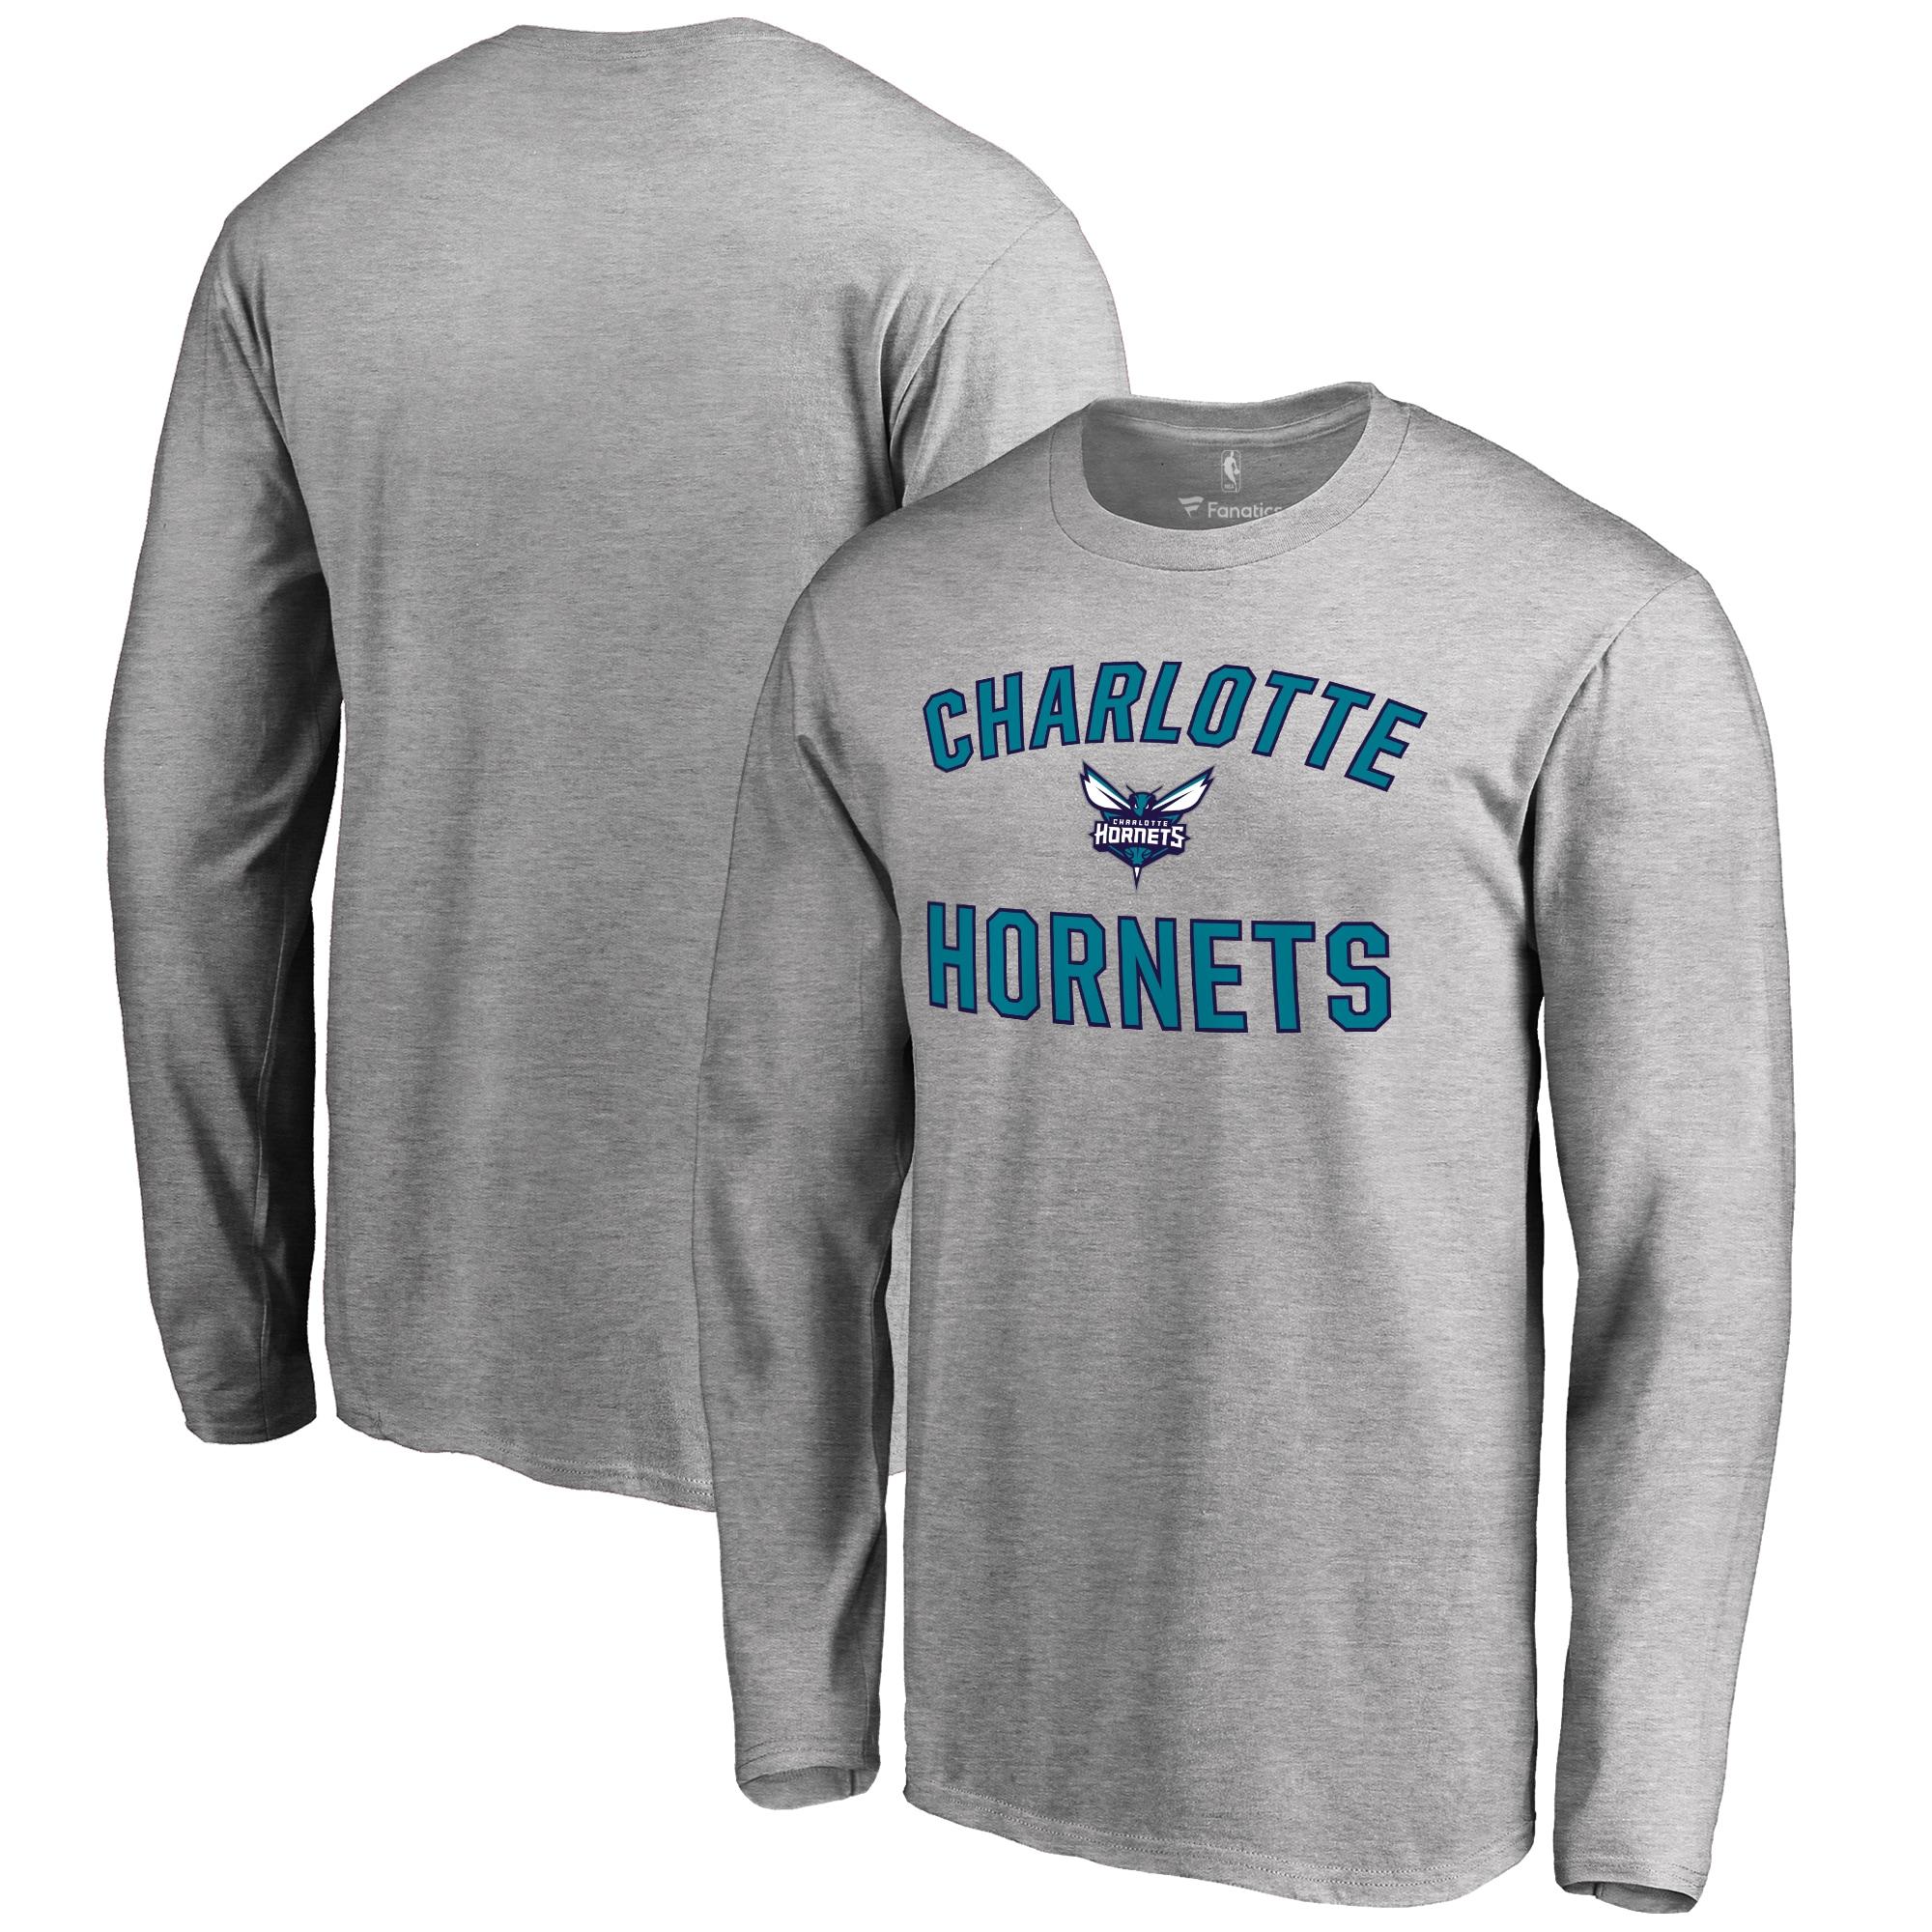 Charlotte Hornets Victory Arch Long Sleeve T-Shirt - Ash